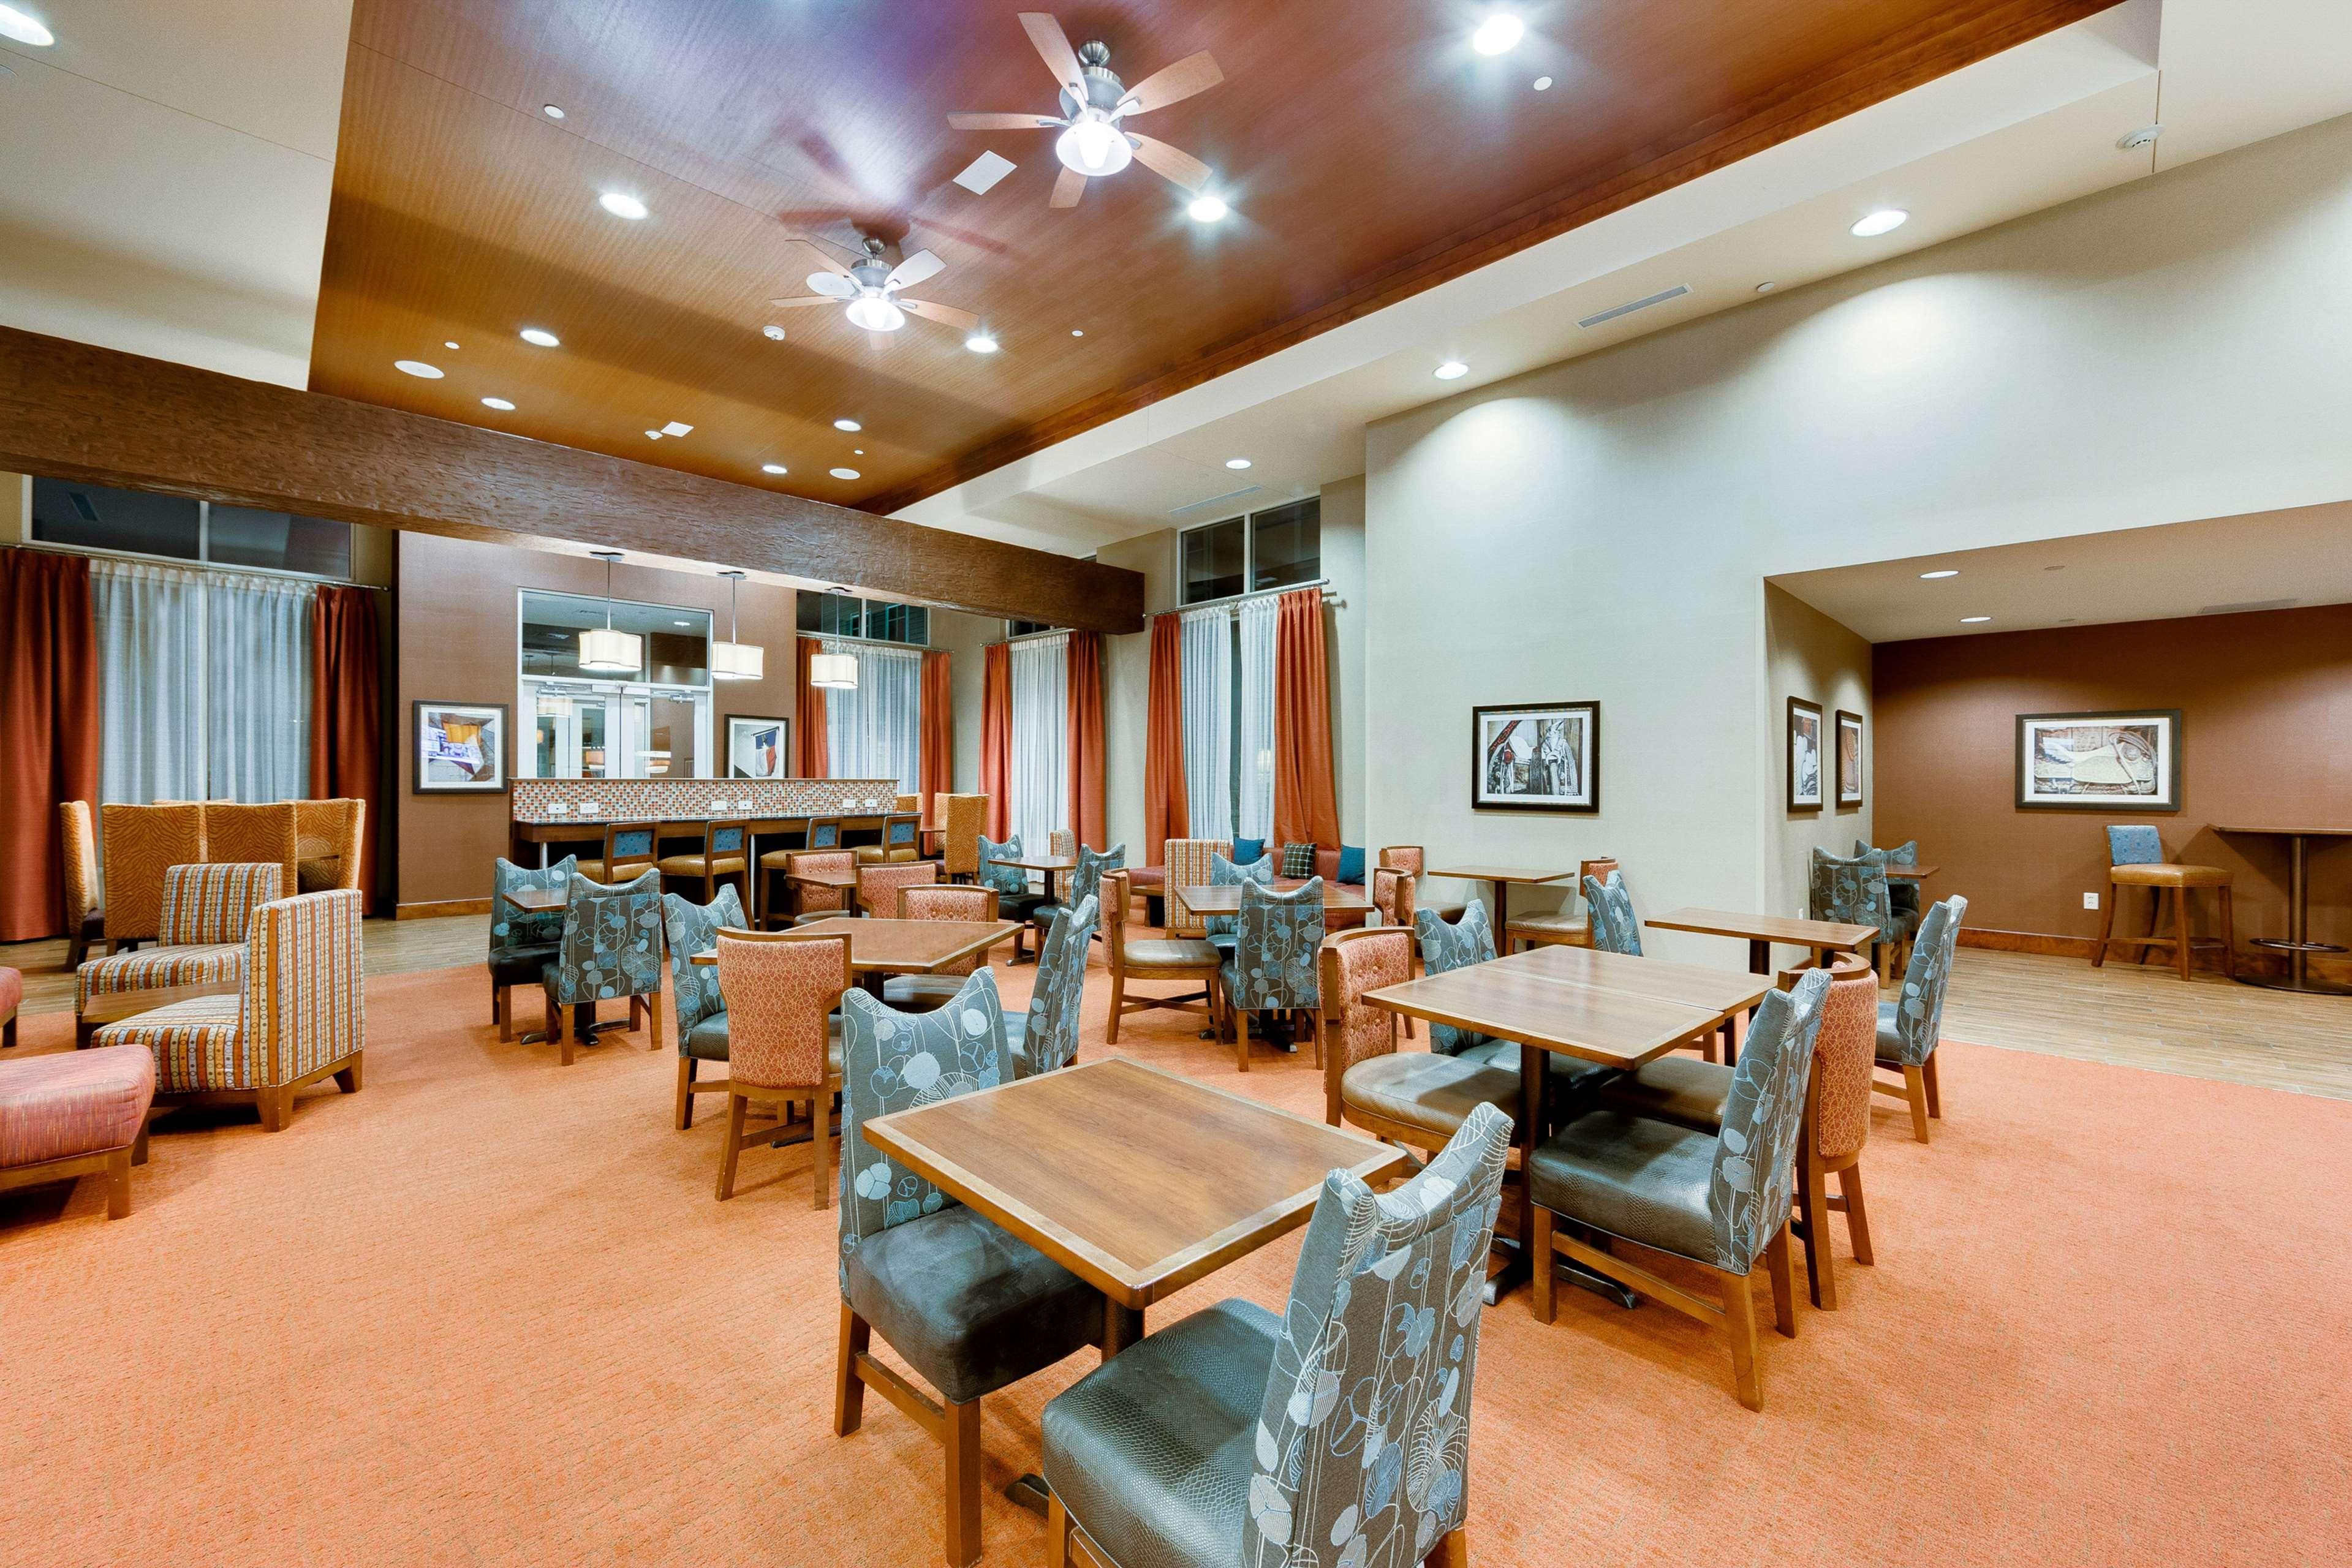 Homewood Suites by Hilton Fort Worth - Medical Center, TX image 8